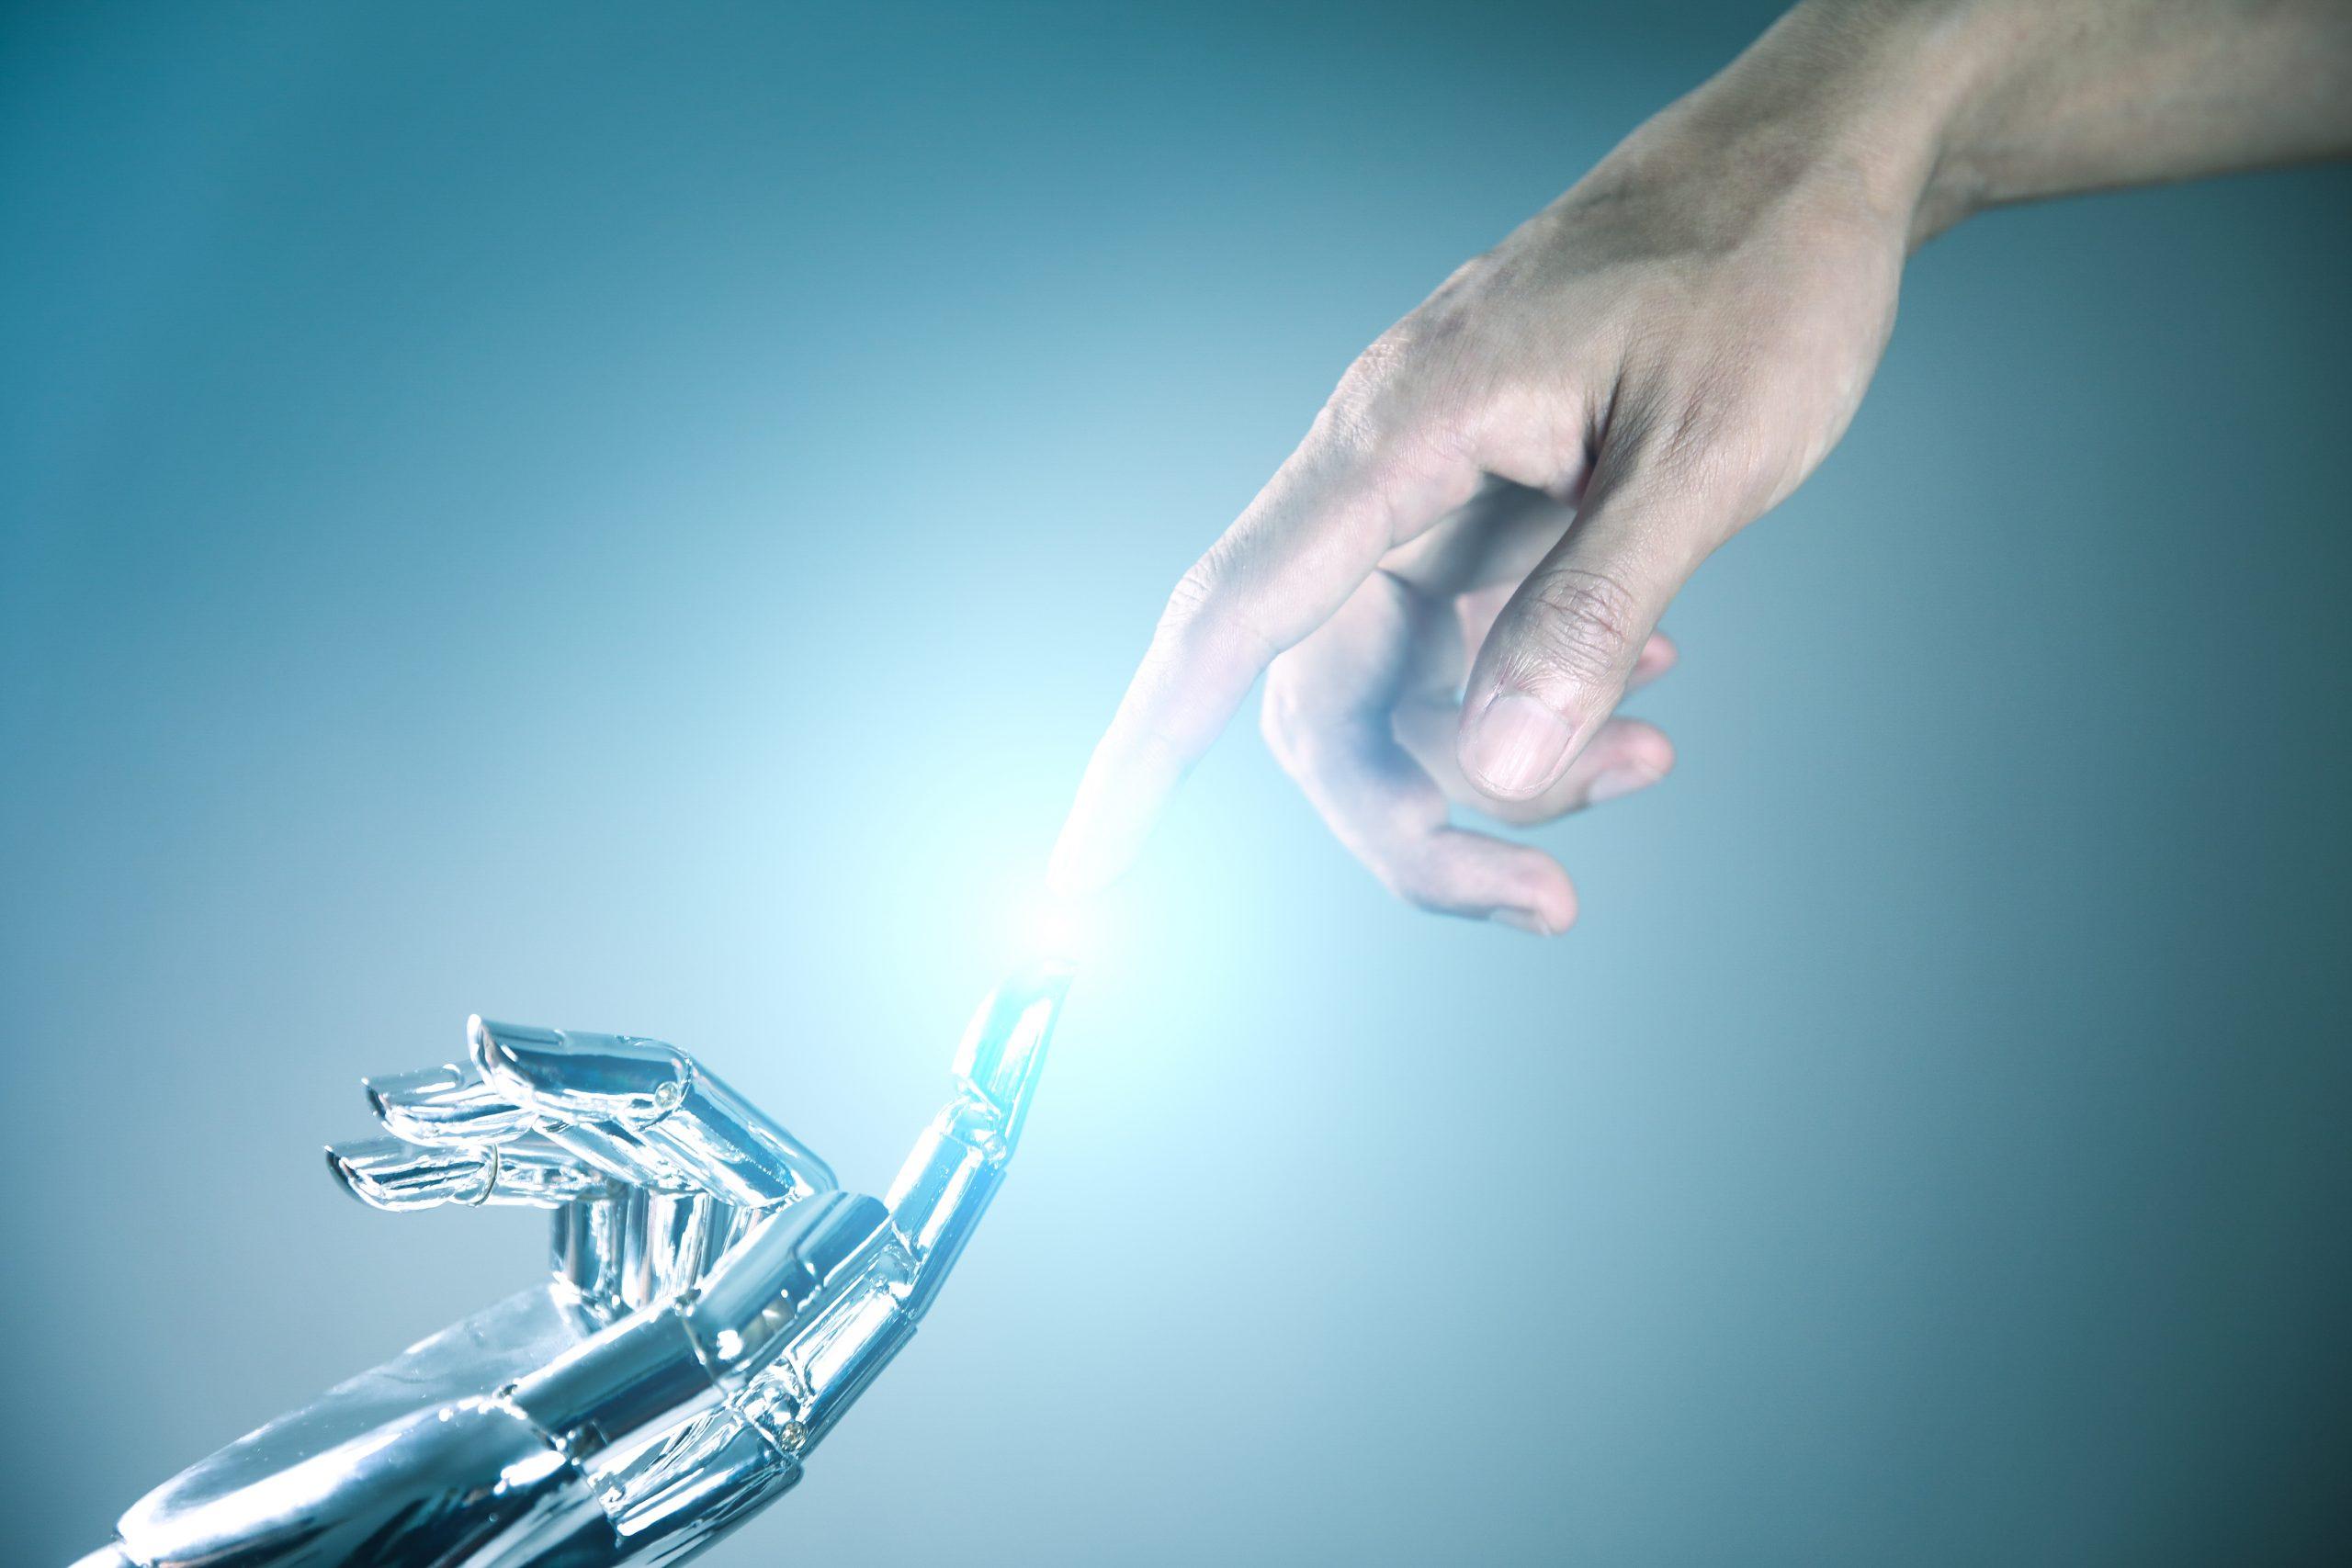 Human and robot hand connecting, indicating digital customer care